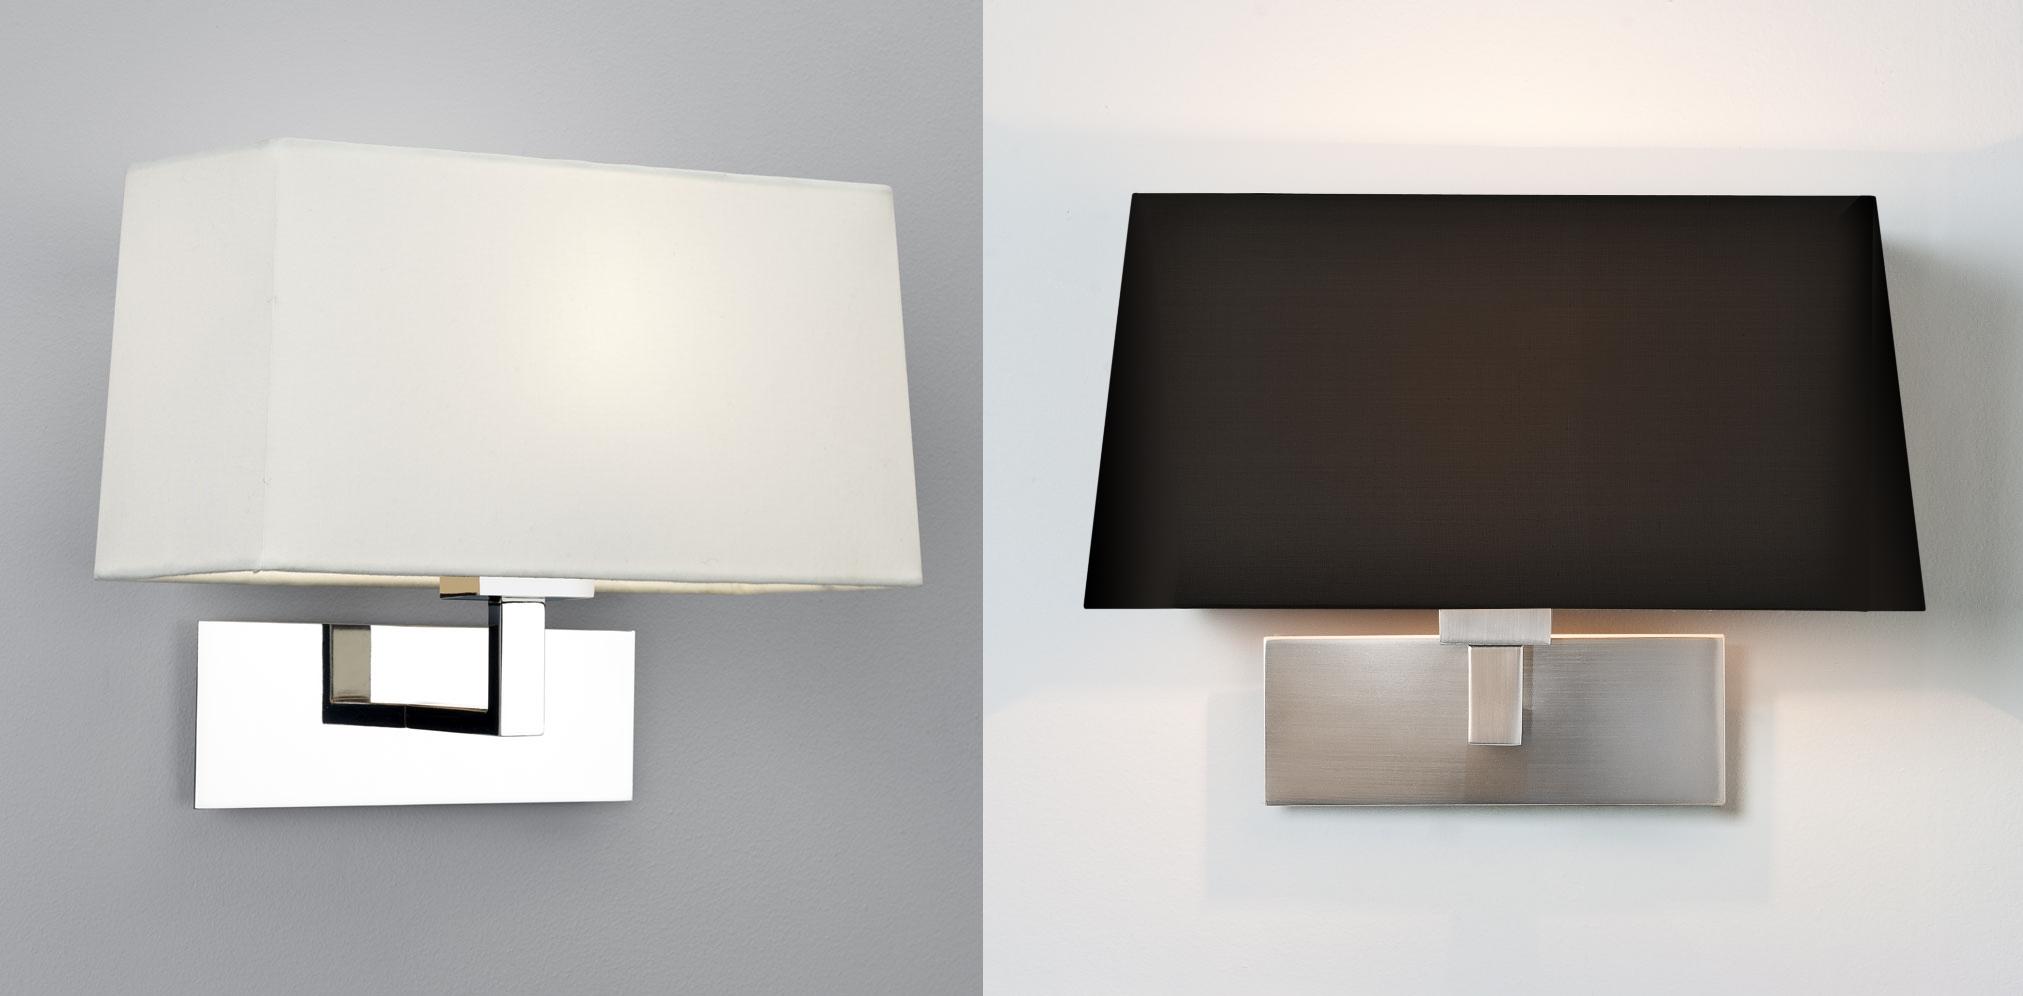 Astro Park Lane Grande tapered shade wall Light 60W E27 bronze polished nickel eBay